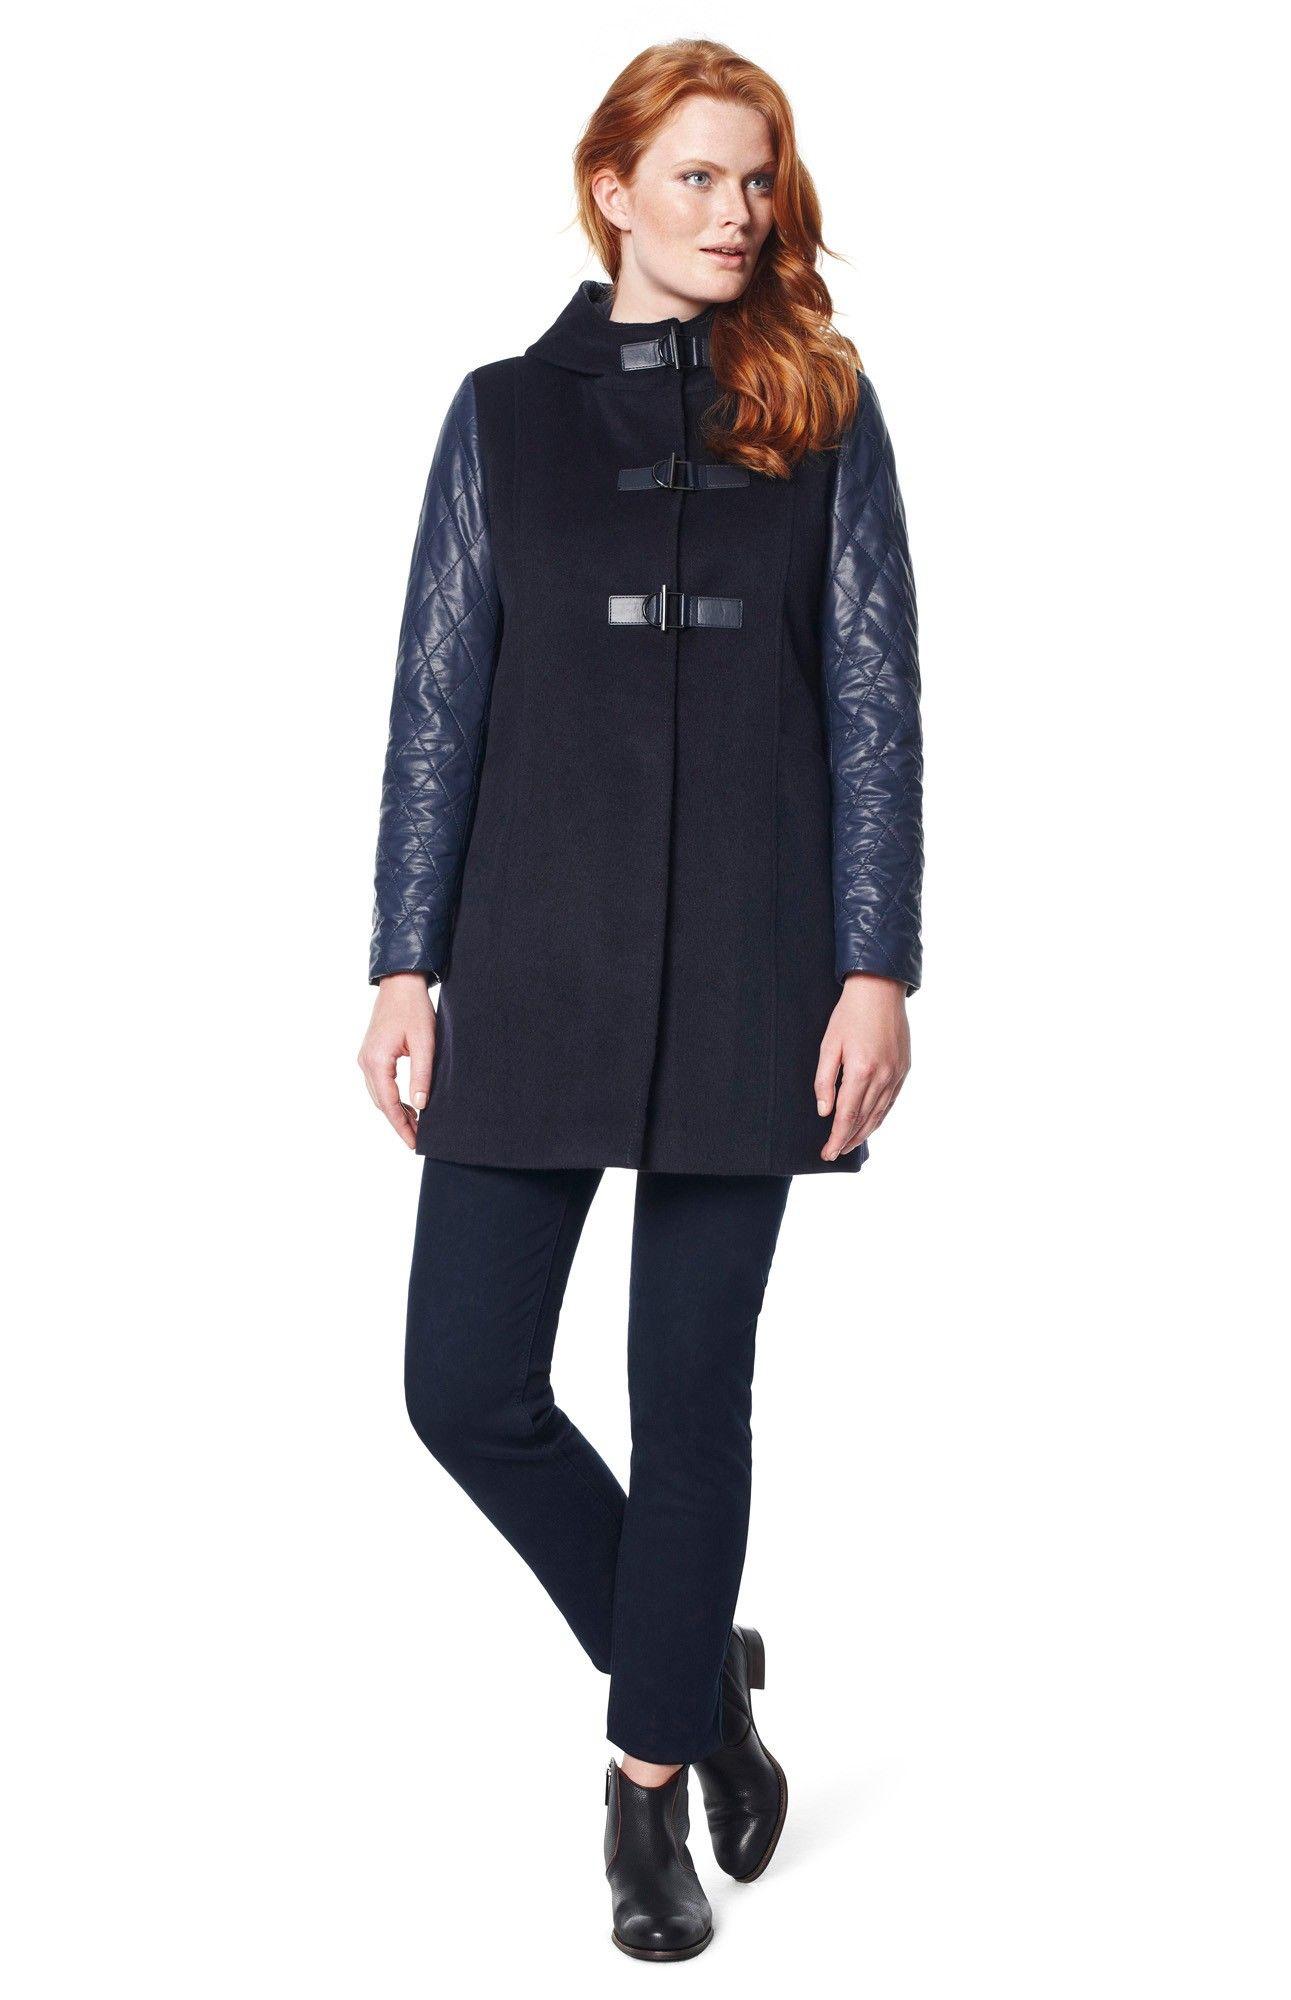 chaquet n combinado abrigos chaquetas adolfo